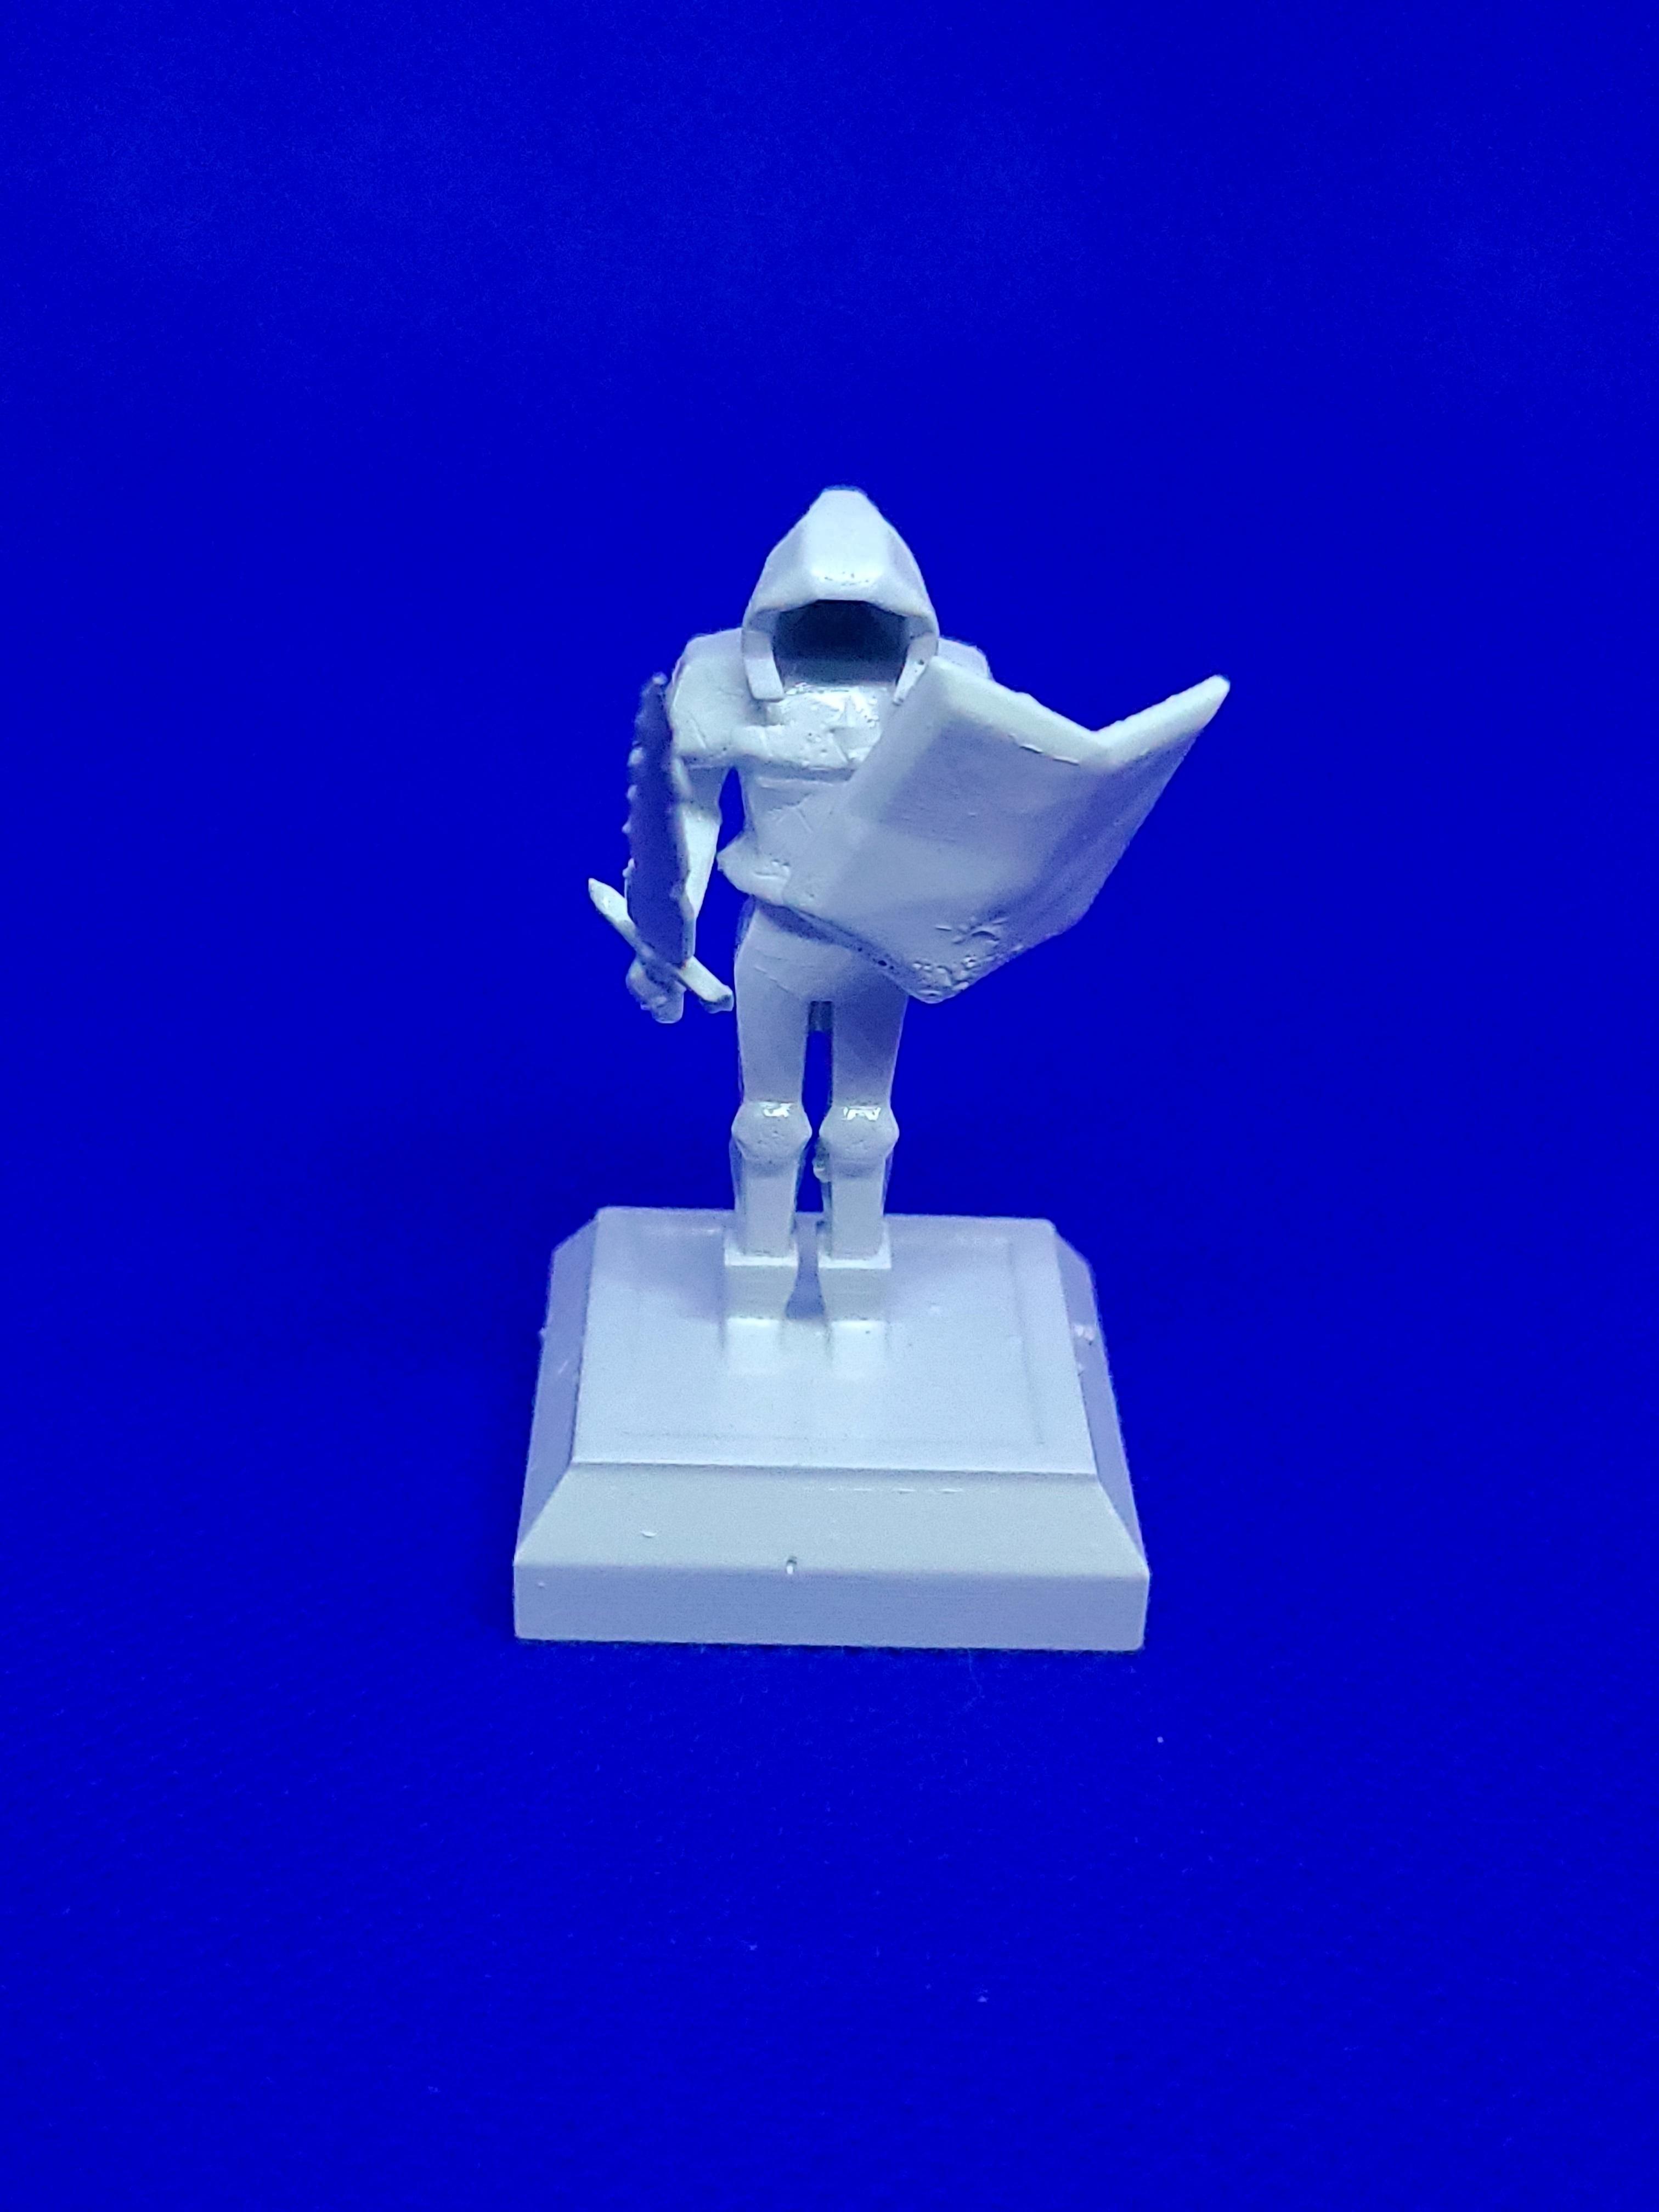 20201015_182738.jpg Download STL file OSRS Chess Set Old School Runescape Mini Figures  • Model to 3D print, Wychu